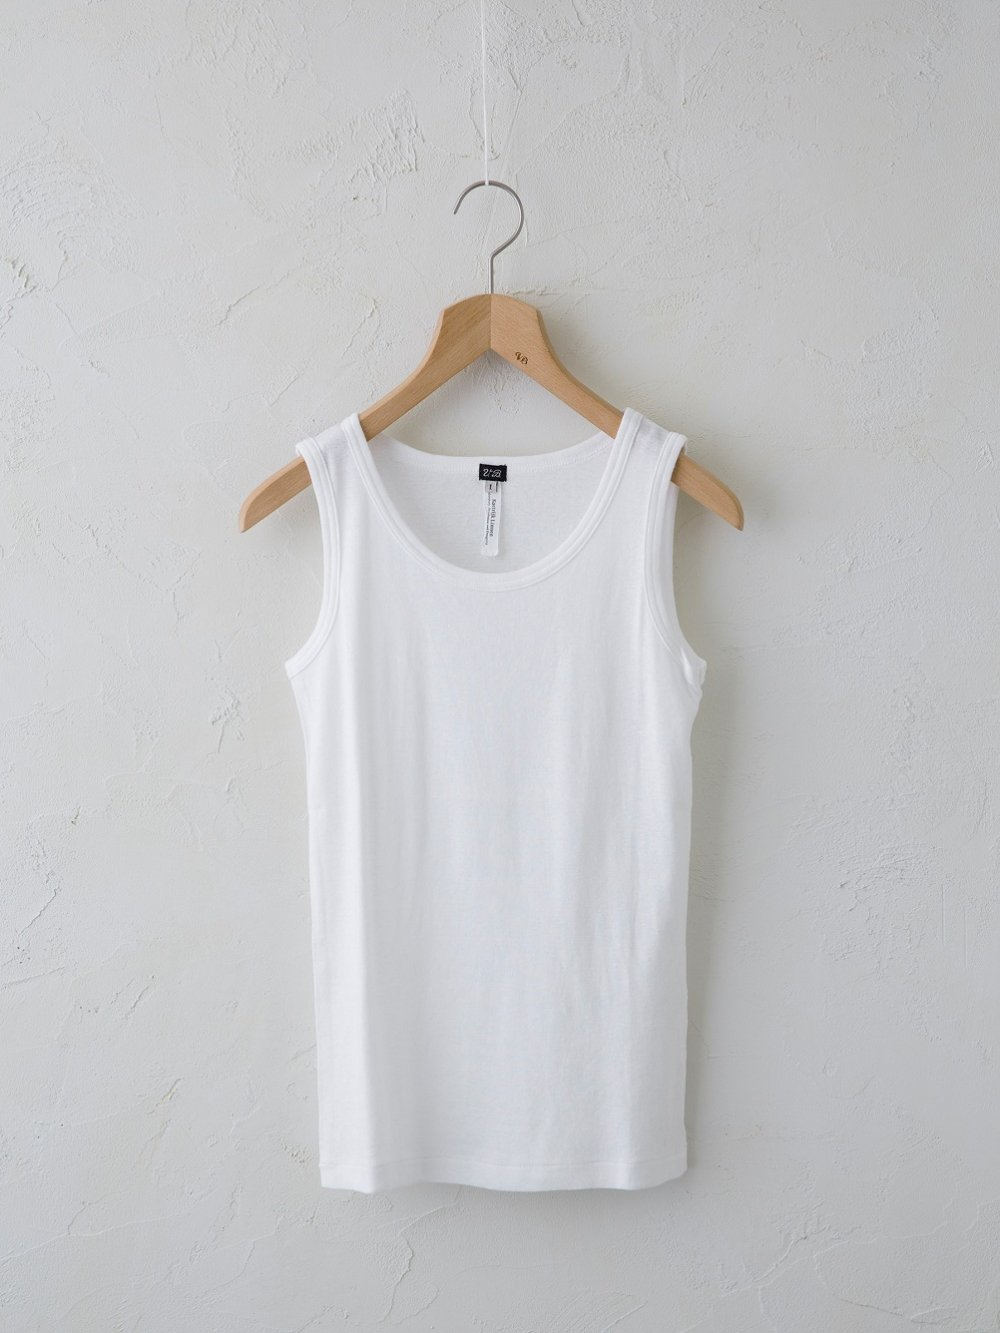 & 12 Linen(フライス)タンクトップ -standard-